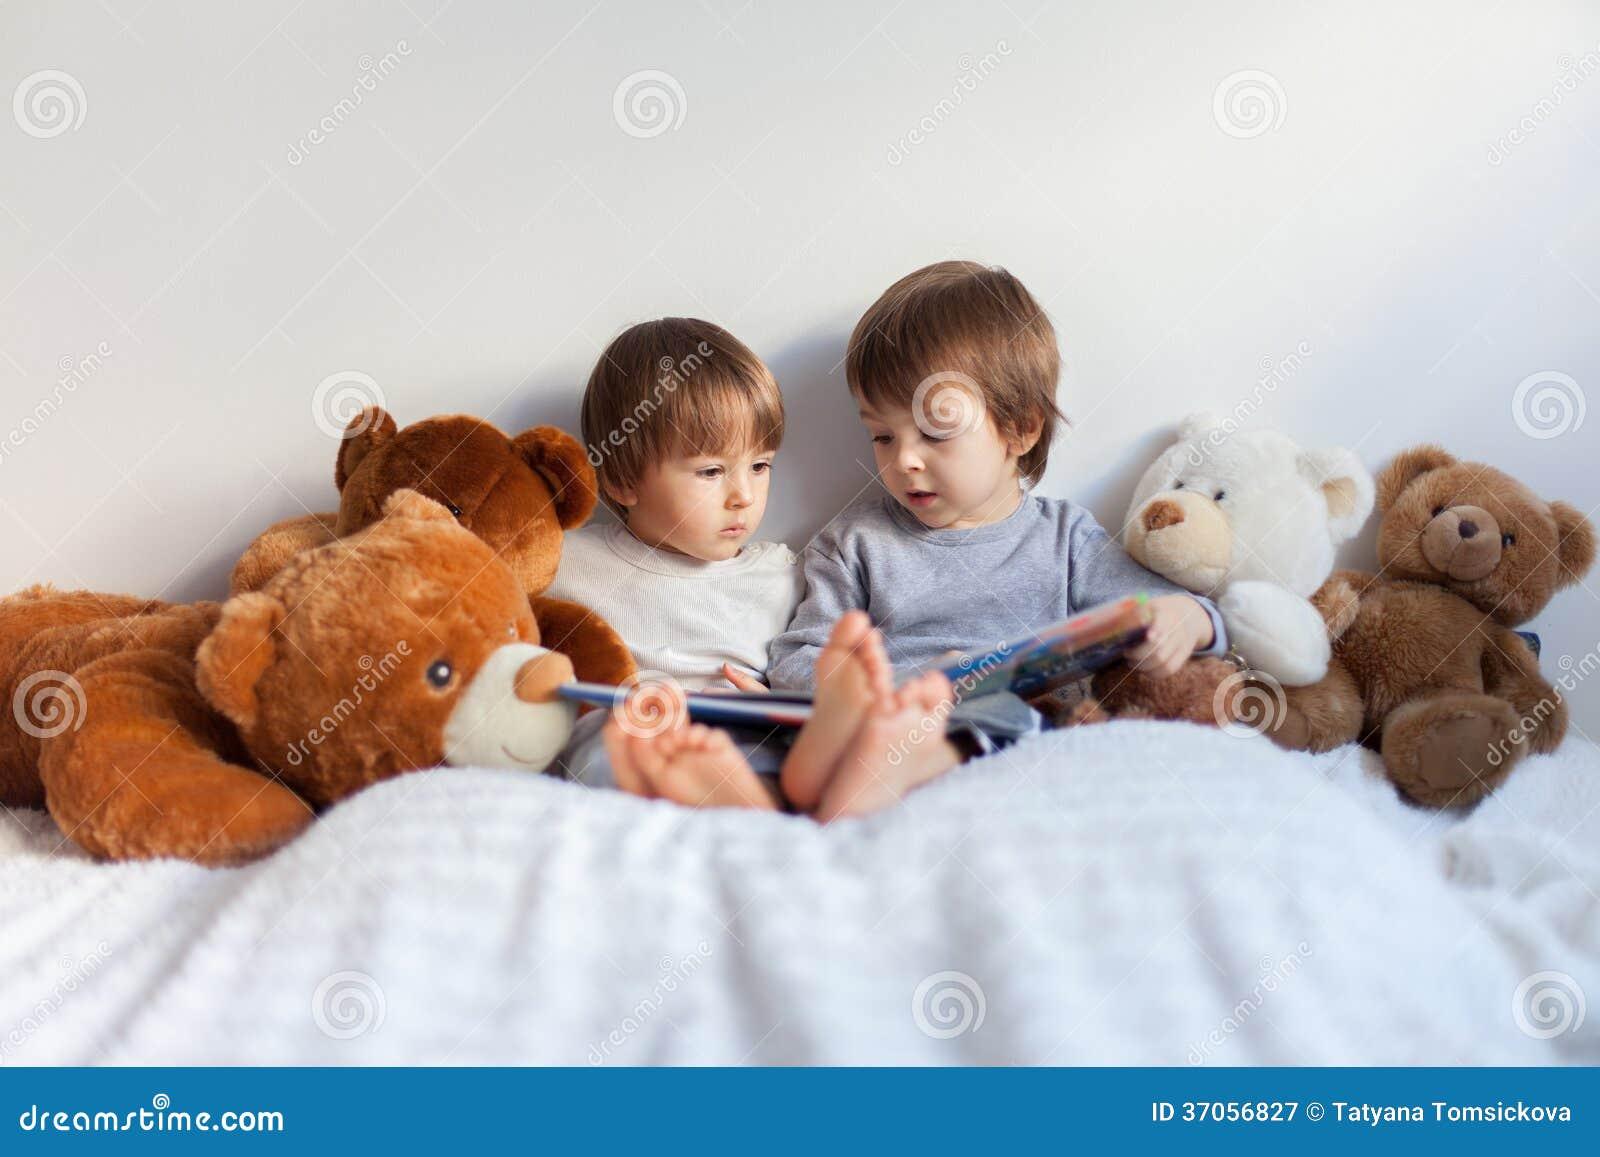 Ni os peque os sent ndose en la cama leyendo un libro - Cama para ninos pequenos ...